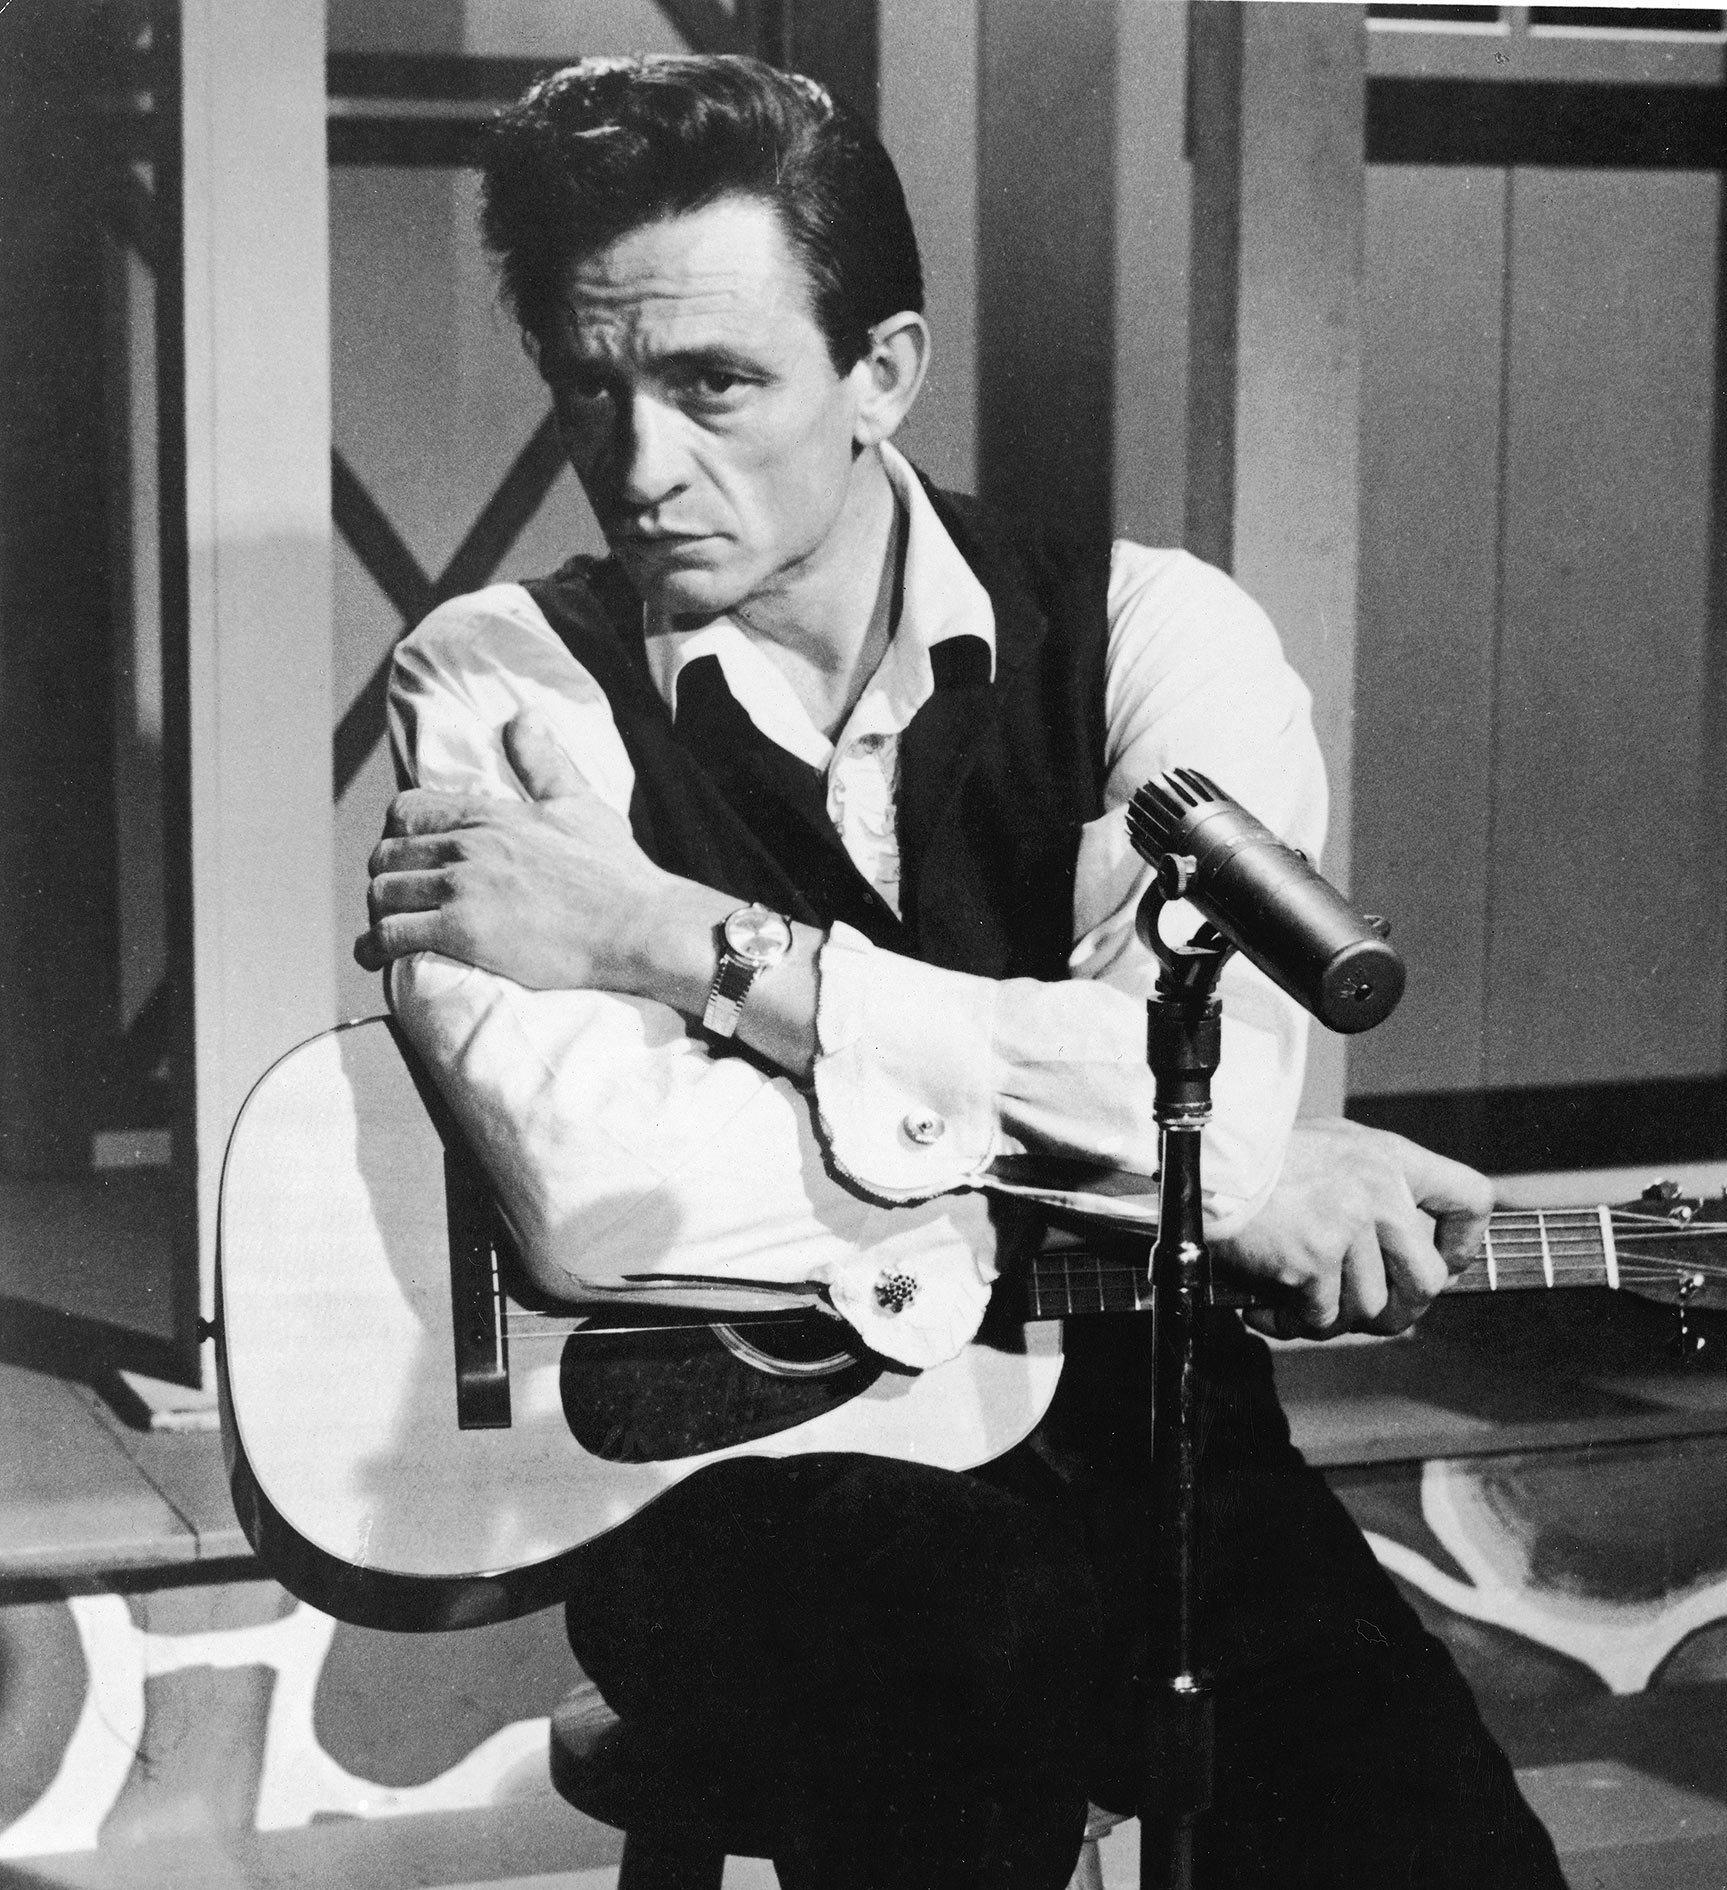 Johnny Cash In 'Road To Nashville'